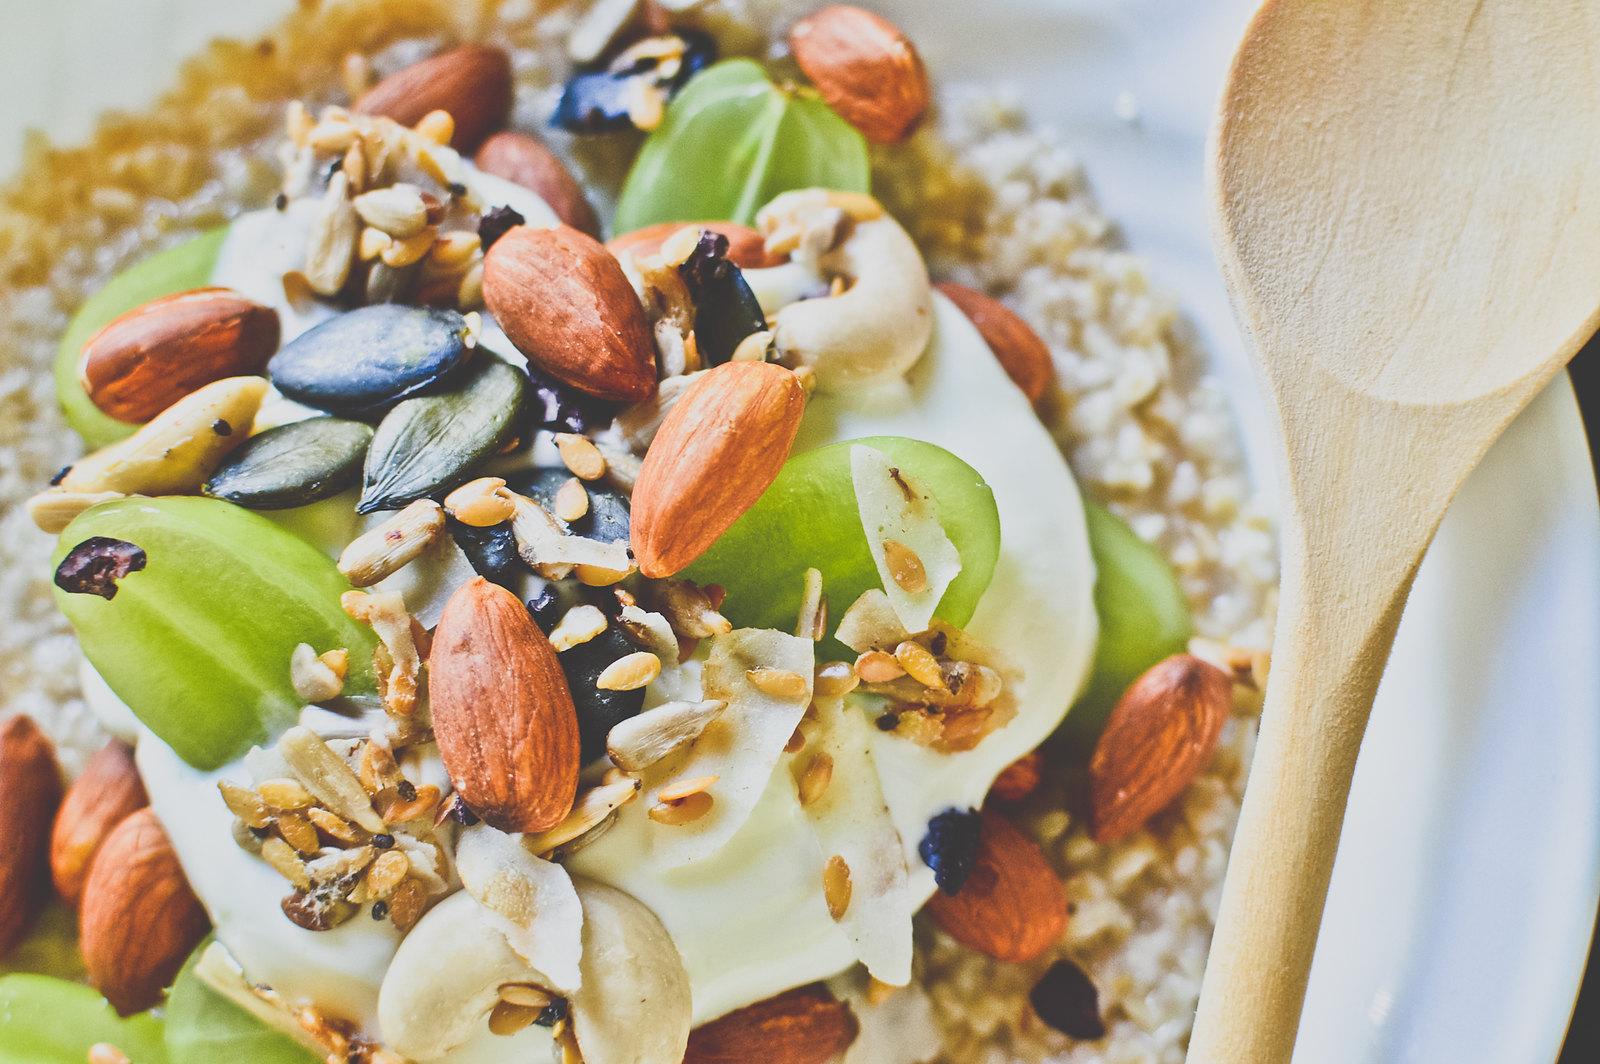 Steel-Cut Oat Porridge with Honey, Roasted Almonds, Green Grapes and Greek Yogurt